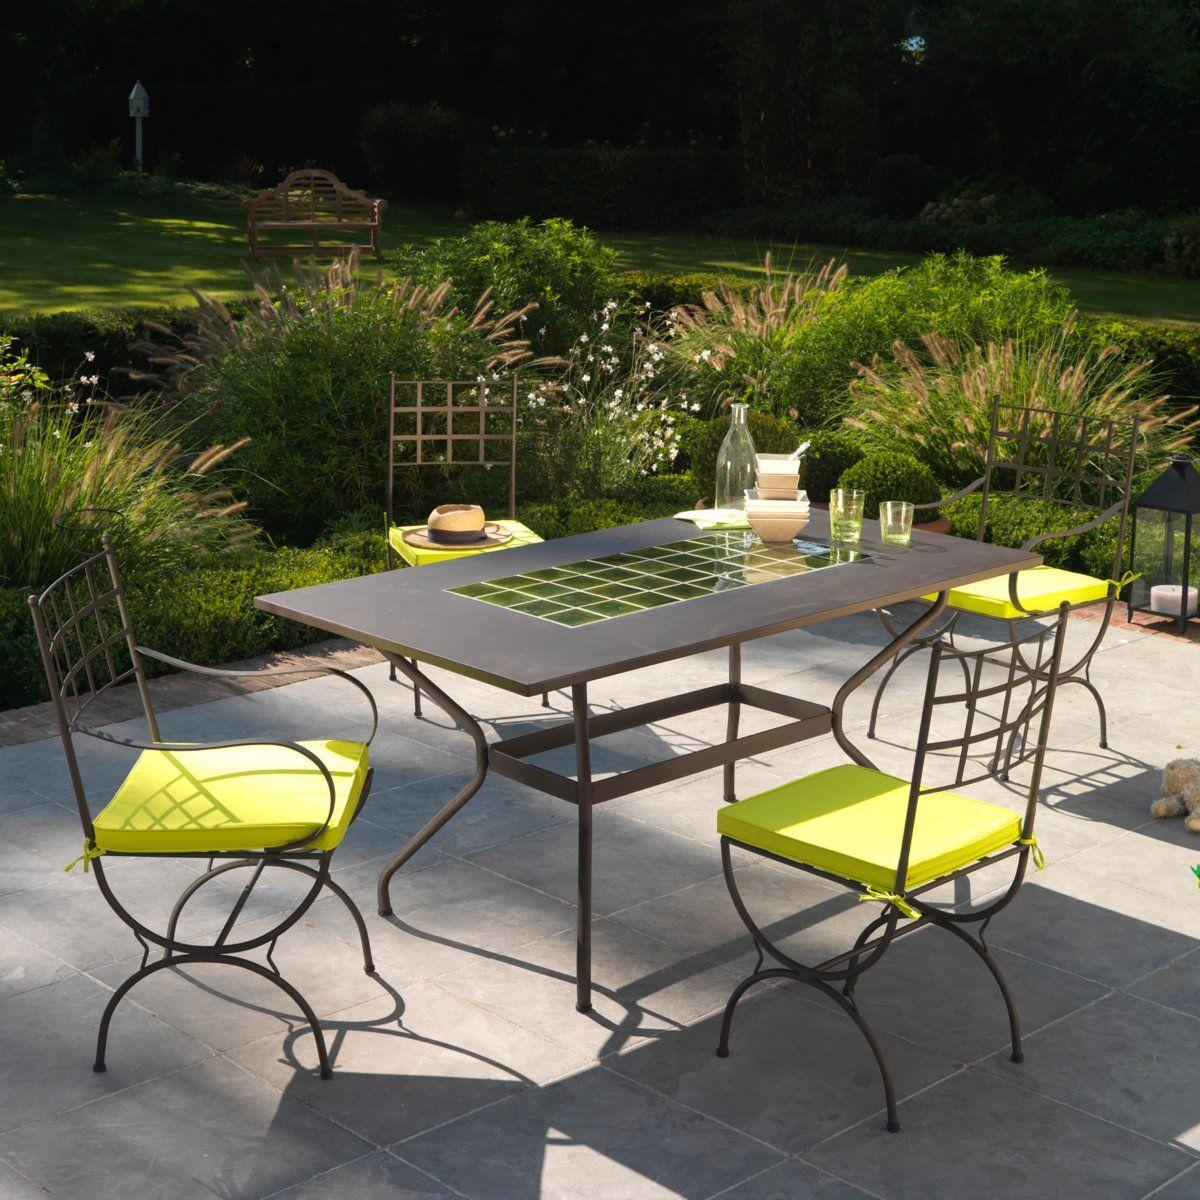 Table De Jardin La Redoute Table De Jardin Fer Forge Et Ceramique Iziva Com Mobilier Jardin Table De Jardin Meubles En Osier En Plein Air